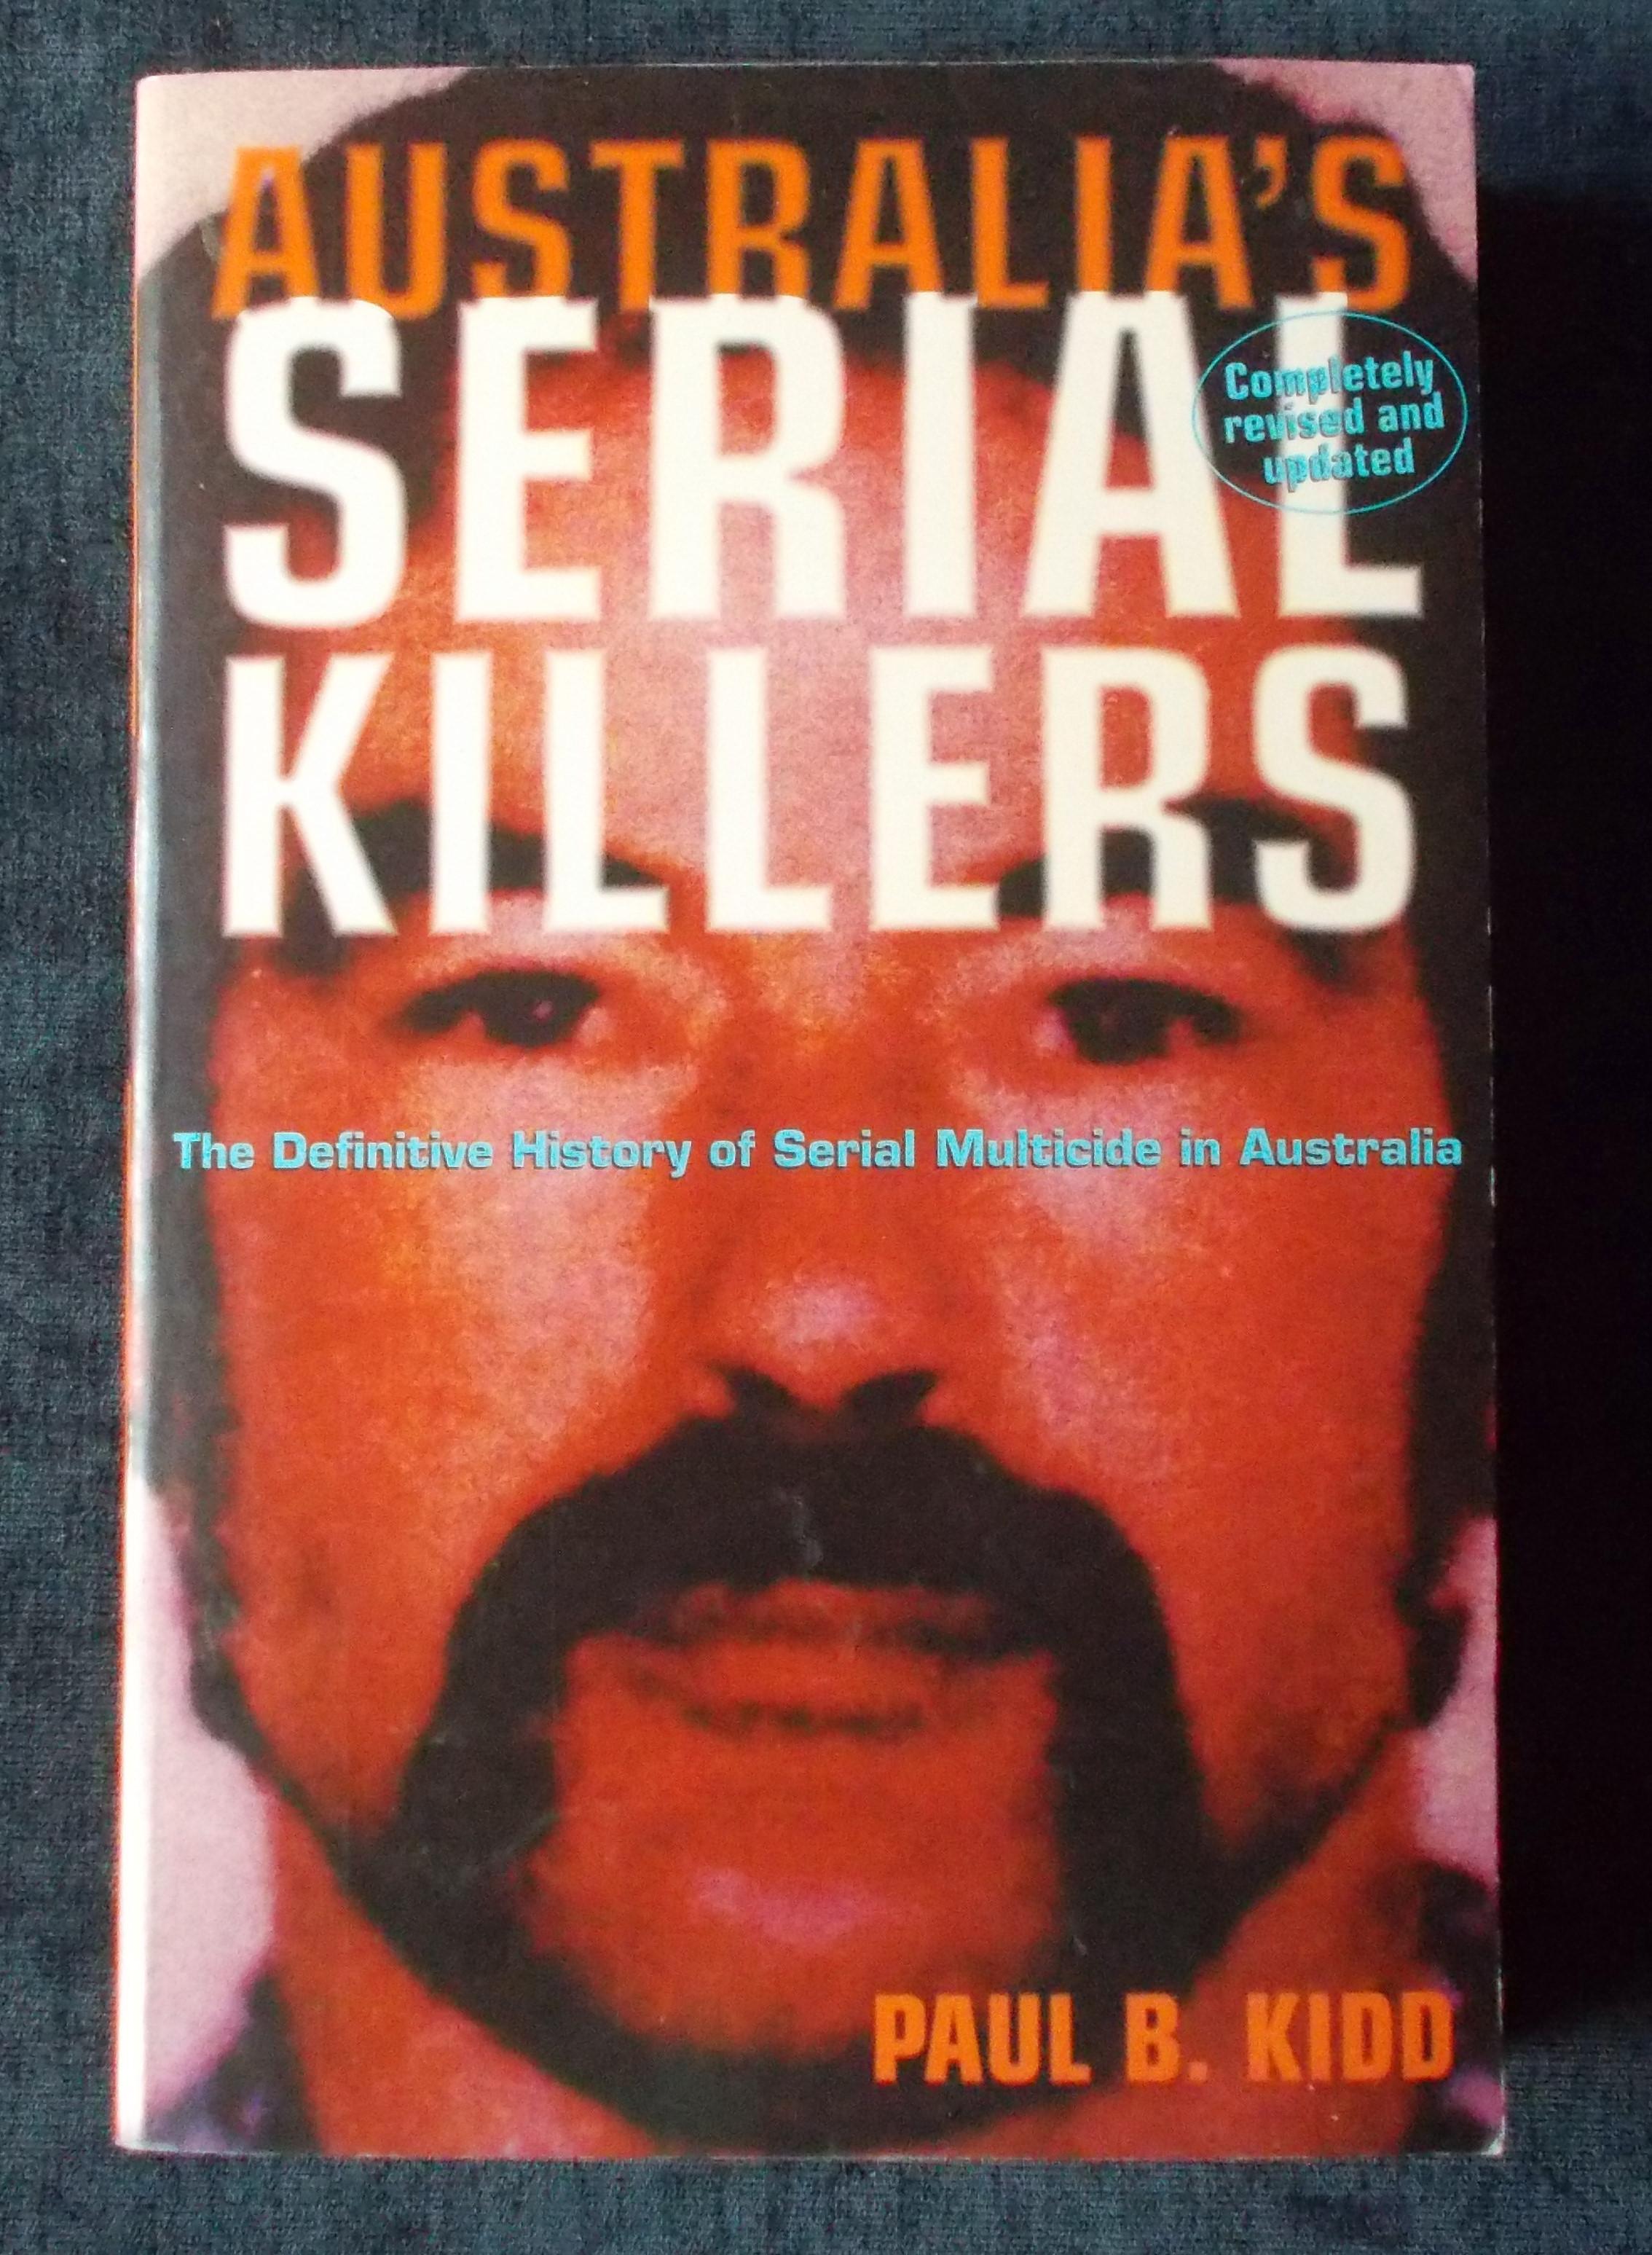 Australias Serial Killers